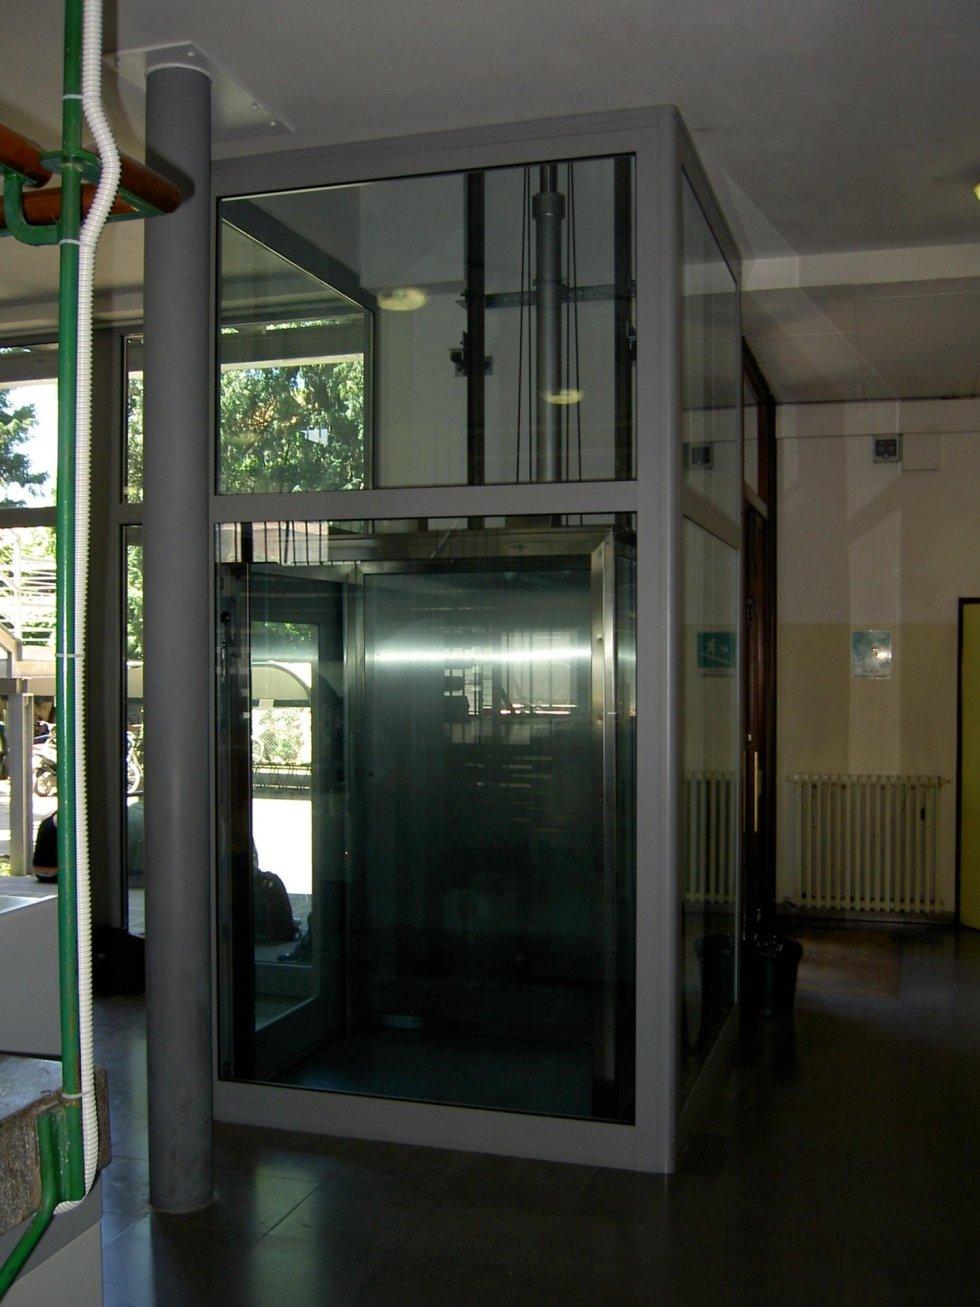 piattaforma elevatrice oleodinamica Incastellatura metallica e vetro-vista frontale